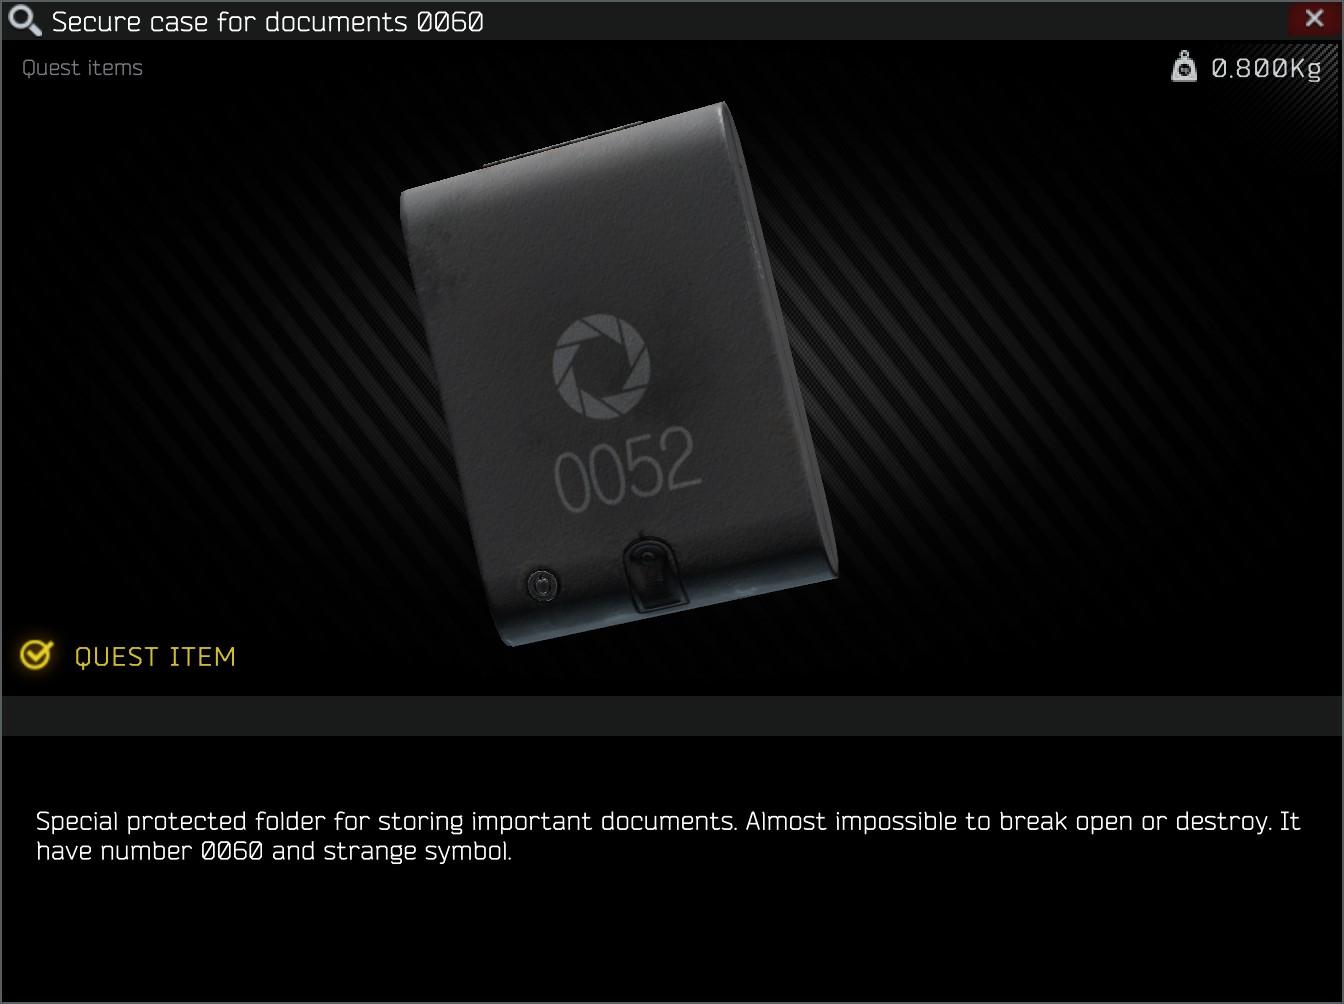 0060_secure_case.jpg